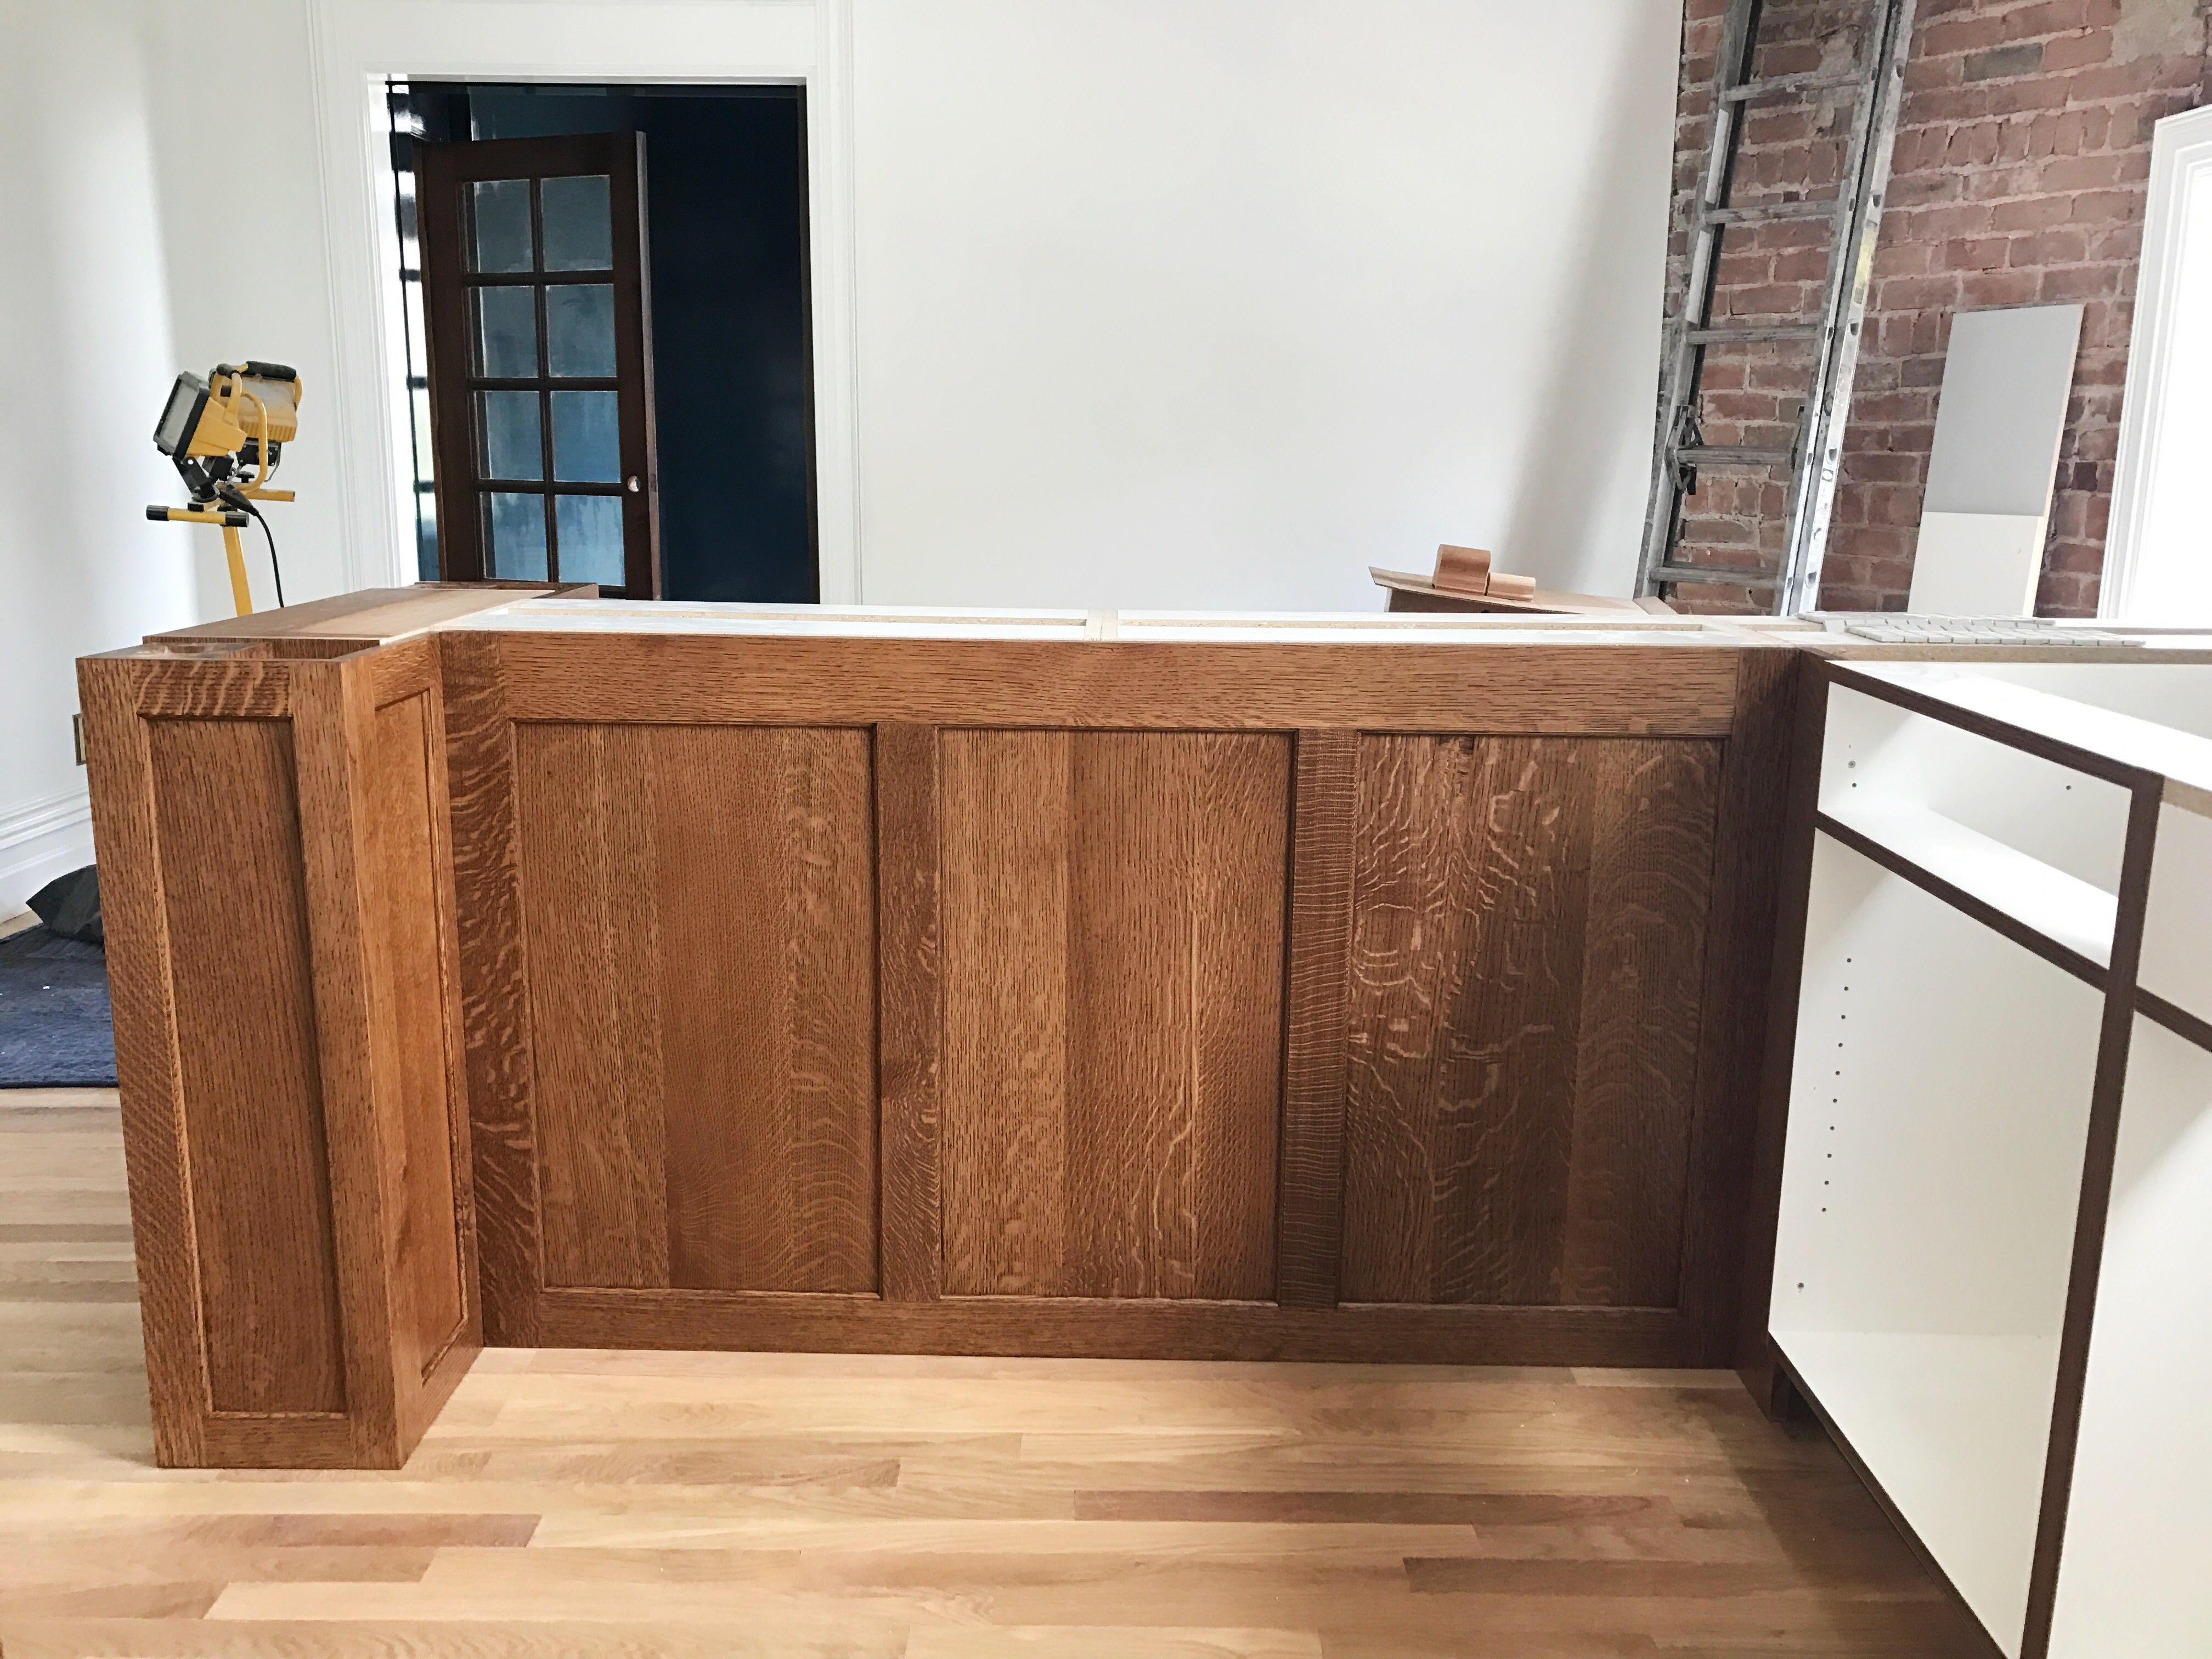 Quarter sawn oak kitchen cabinets. | Oak kitchen cabinets ...